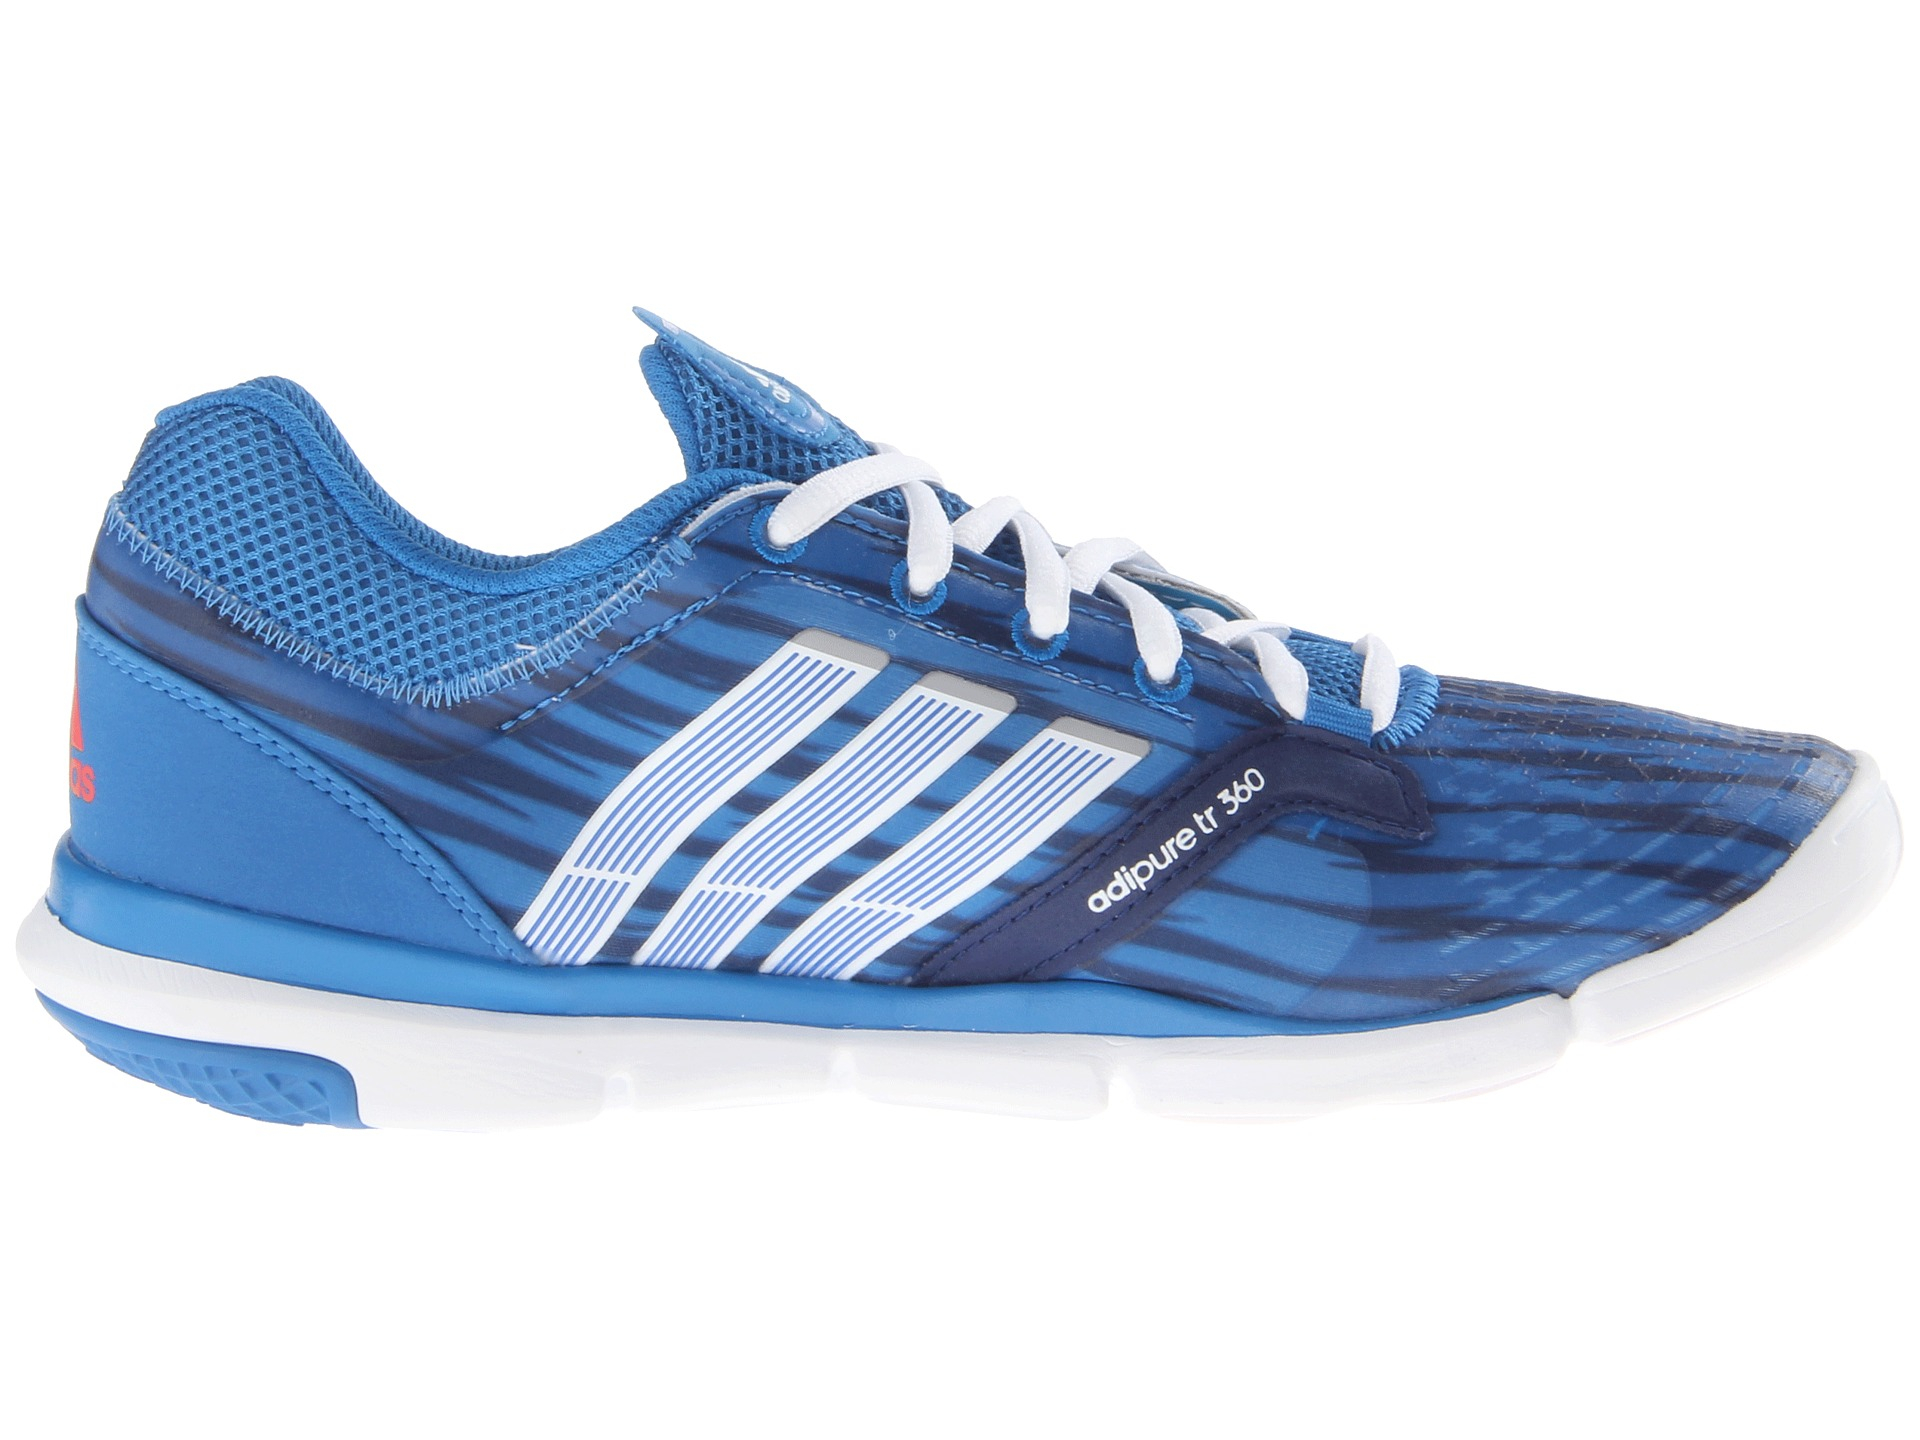 Lyst Adidas Adipure Adipure Trainer Adidas 360 en azul 19933 para hombre 86e4bc2 - antibiotikaamning.website